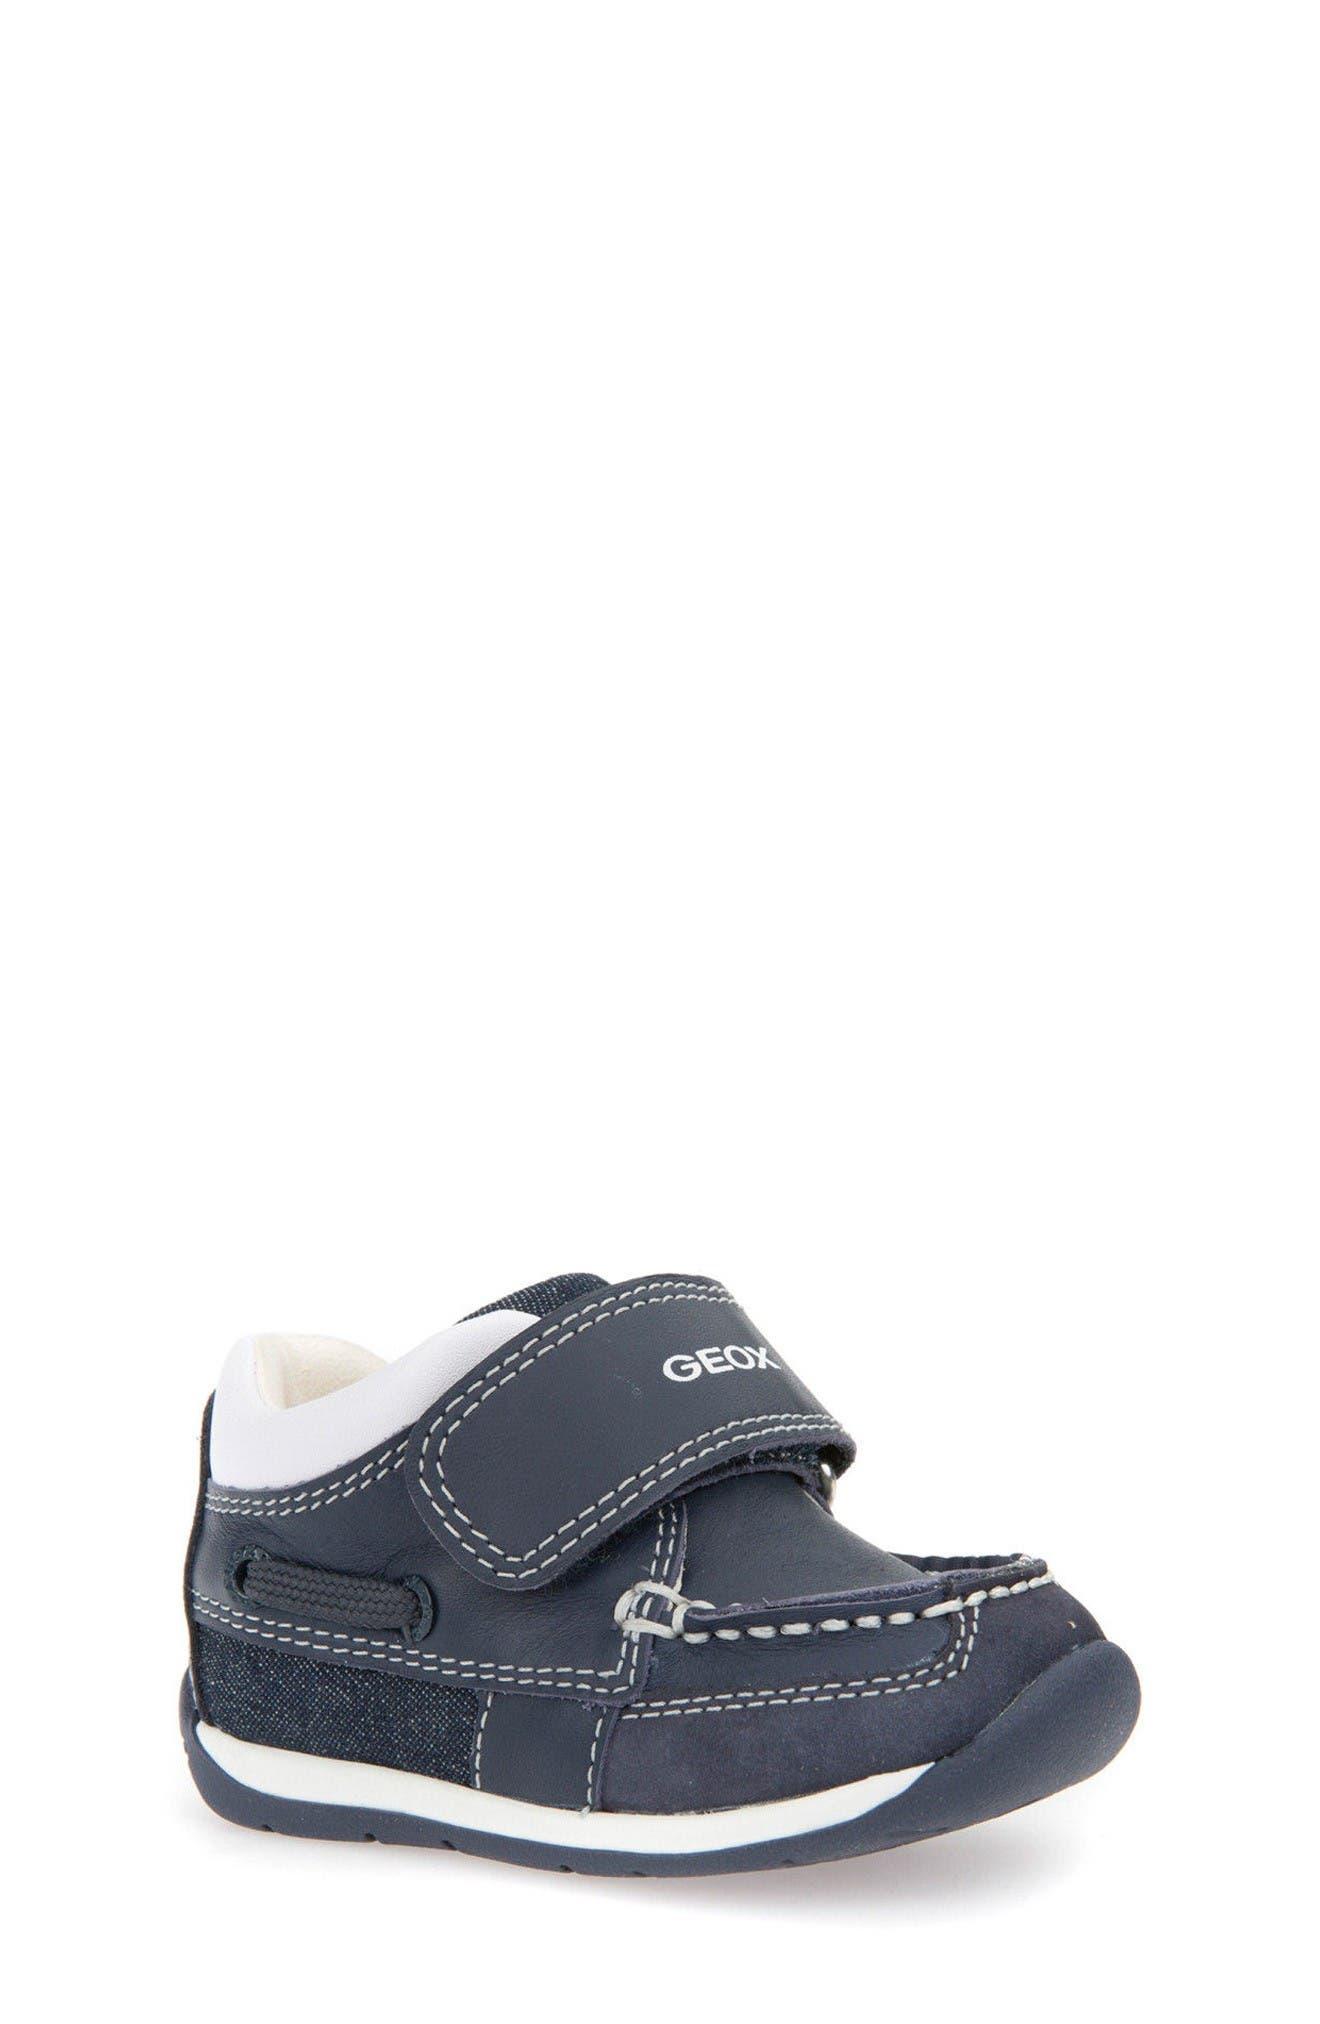 Main Image - Geox Beach Sneaker (Baby, Walker & Toddler)